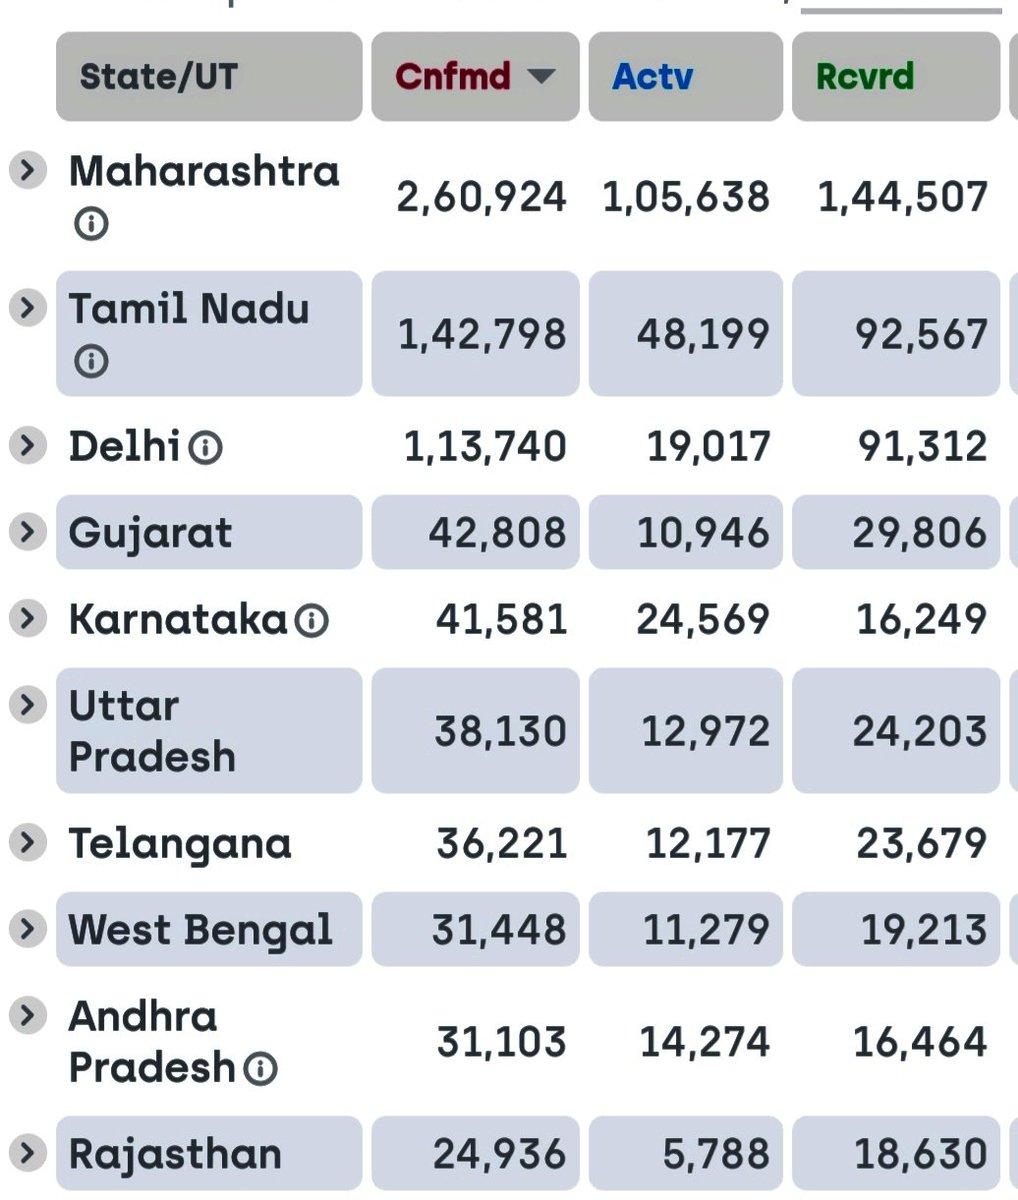 TOP 10 STATE IN INDIA COVID-19 AFFECTED ON 13-th July.#India #IndiaFightsCorona #Covid_19 #COVID19India #TamilNaduCoronaupdate #TNCoronaUpdate #TNFightsCorona #trichy #Chennai #இந்தியா #கொரோனாpic.twitter.com/xxlpEKEmYz